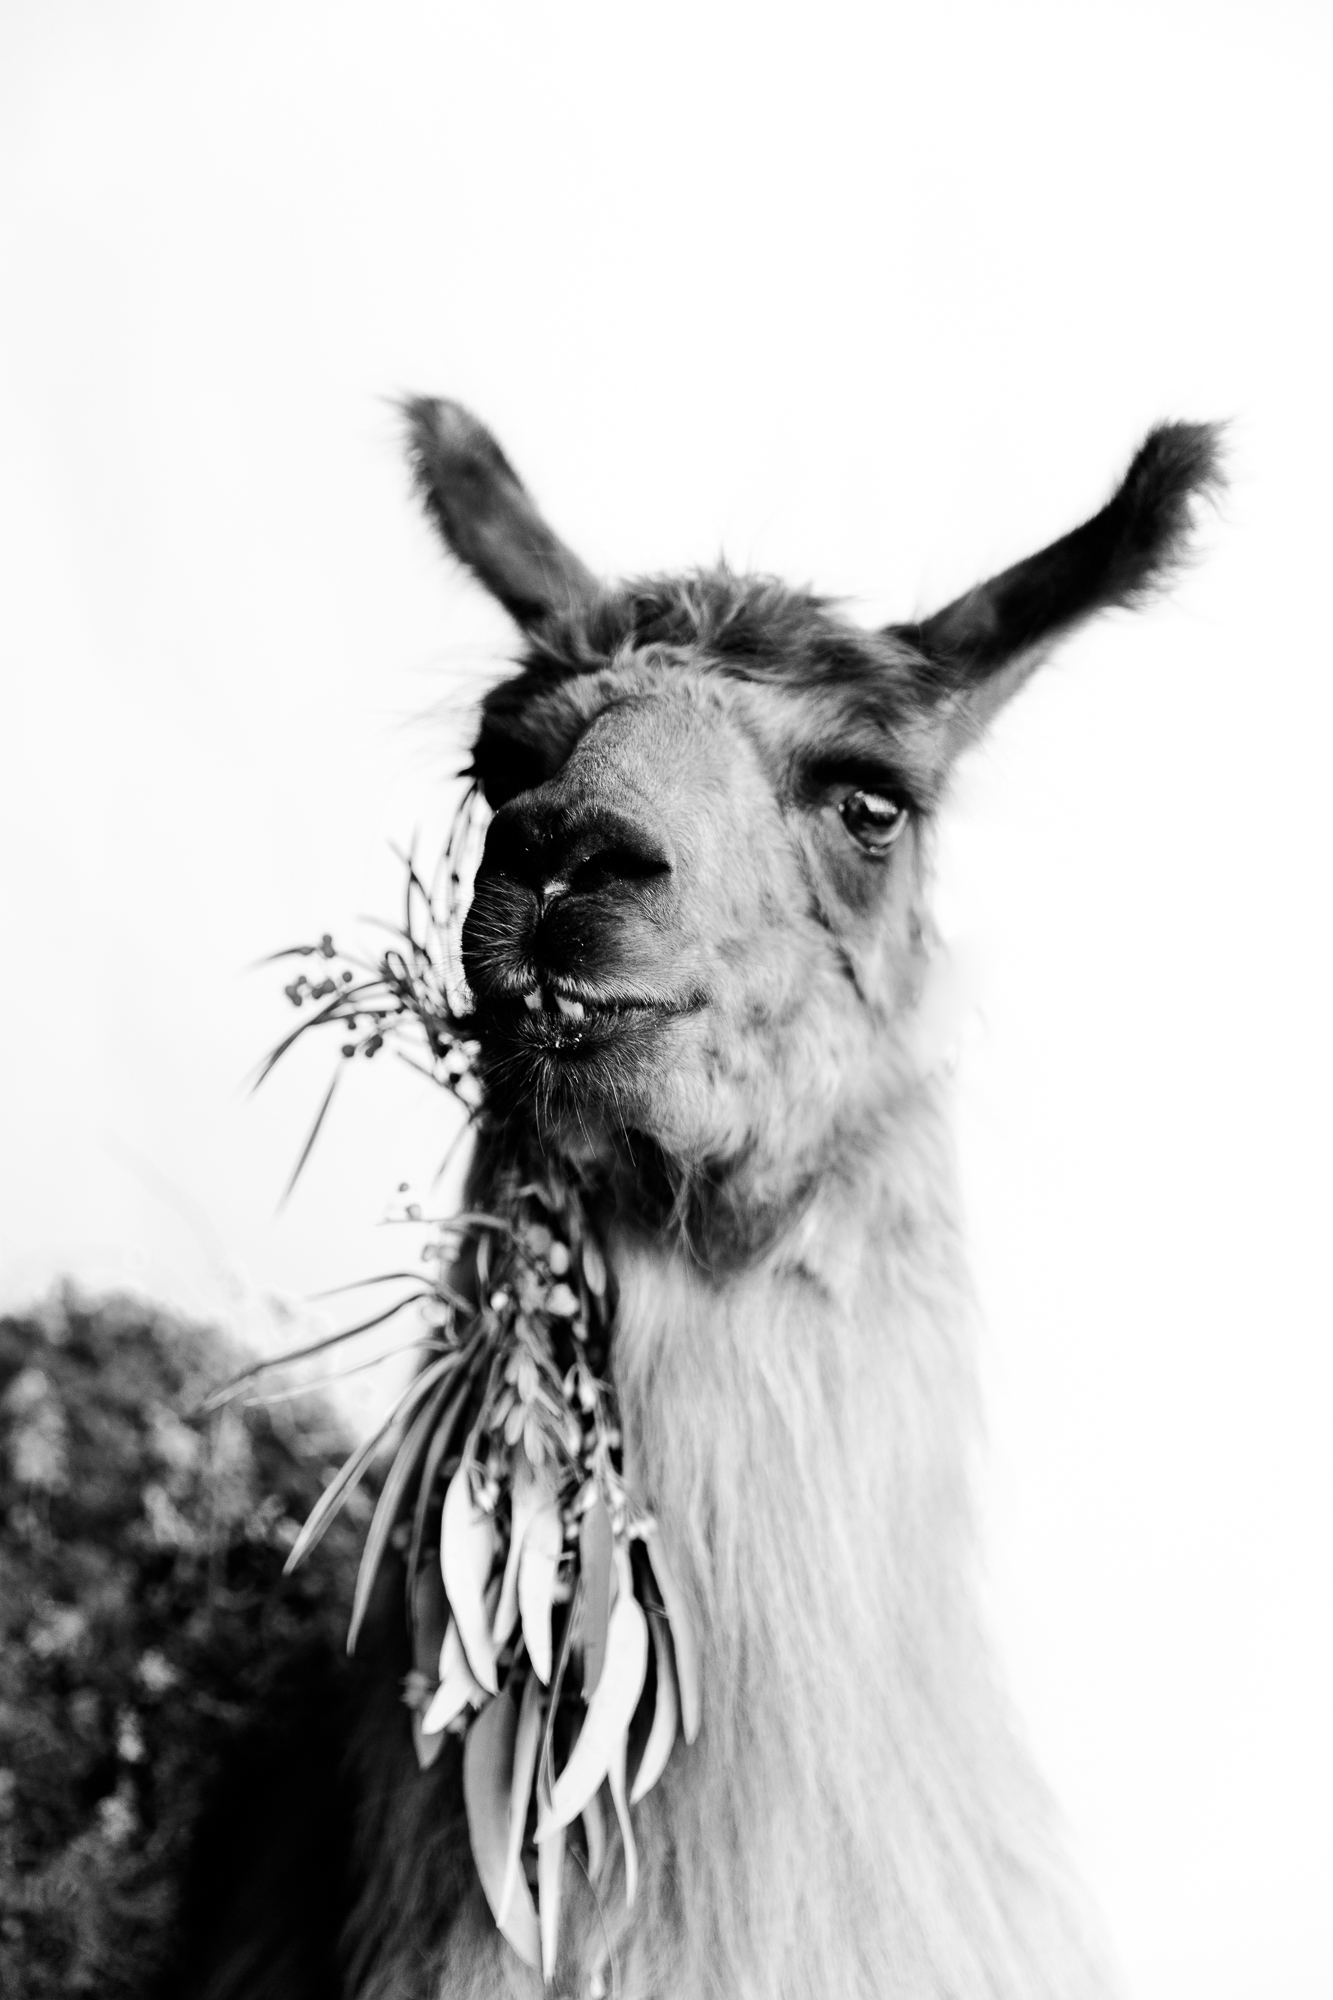 llama_portland_animal-8.JPG